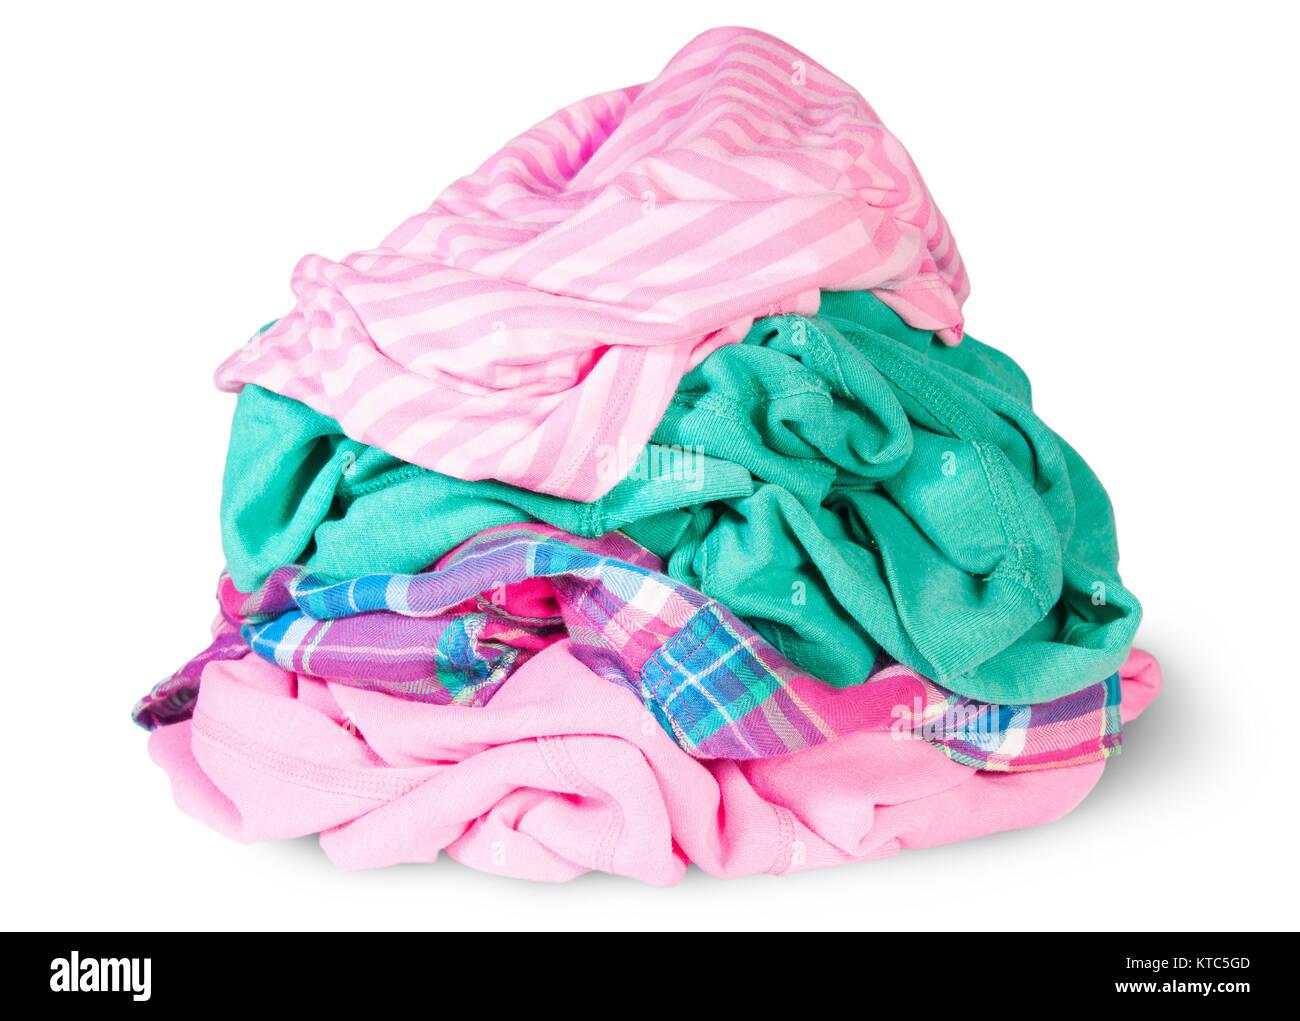 Creased Clothes Stock Photos & Creased Clothes Stock ...